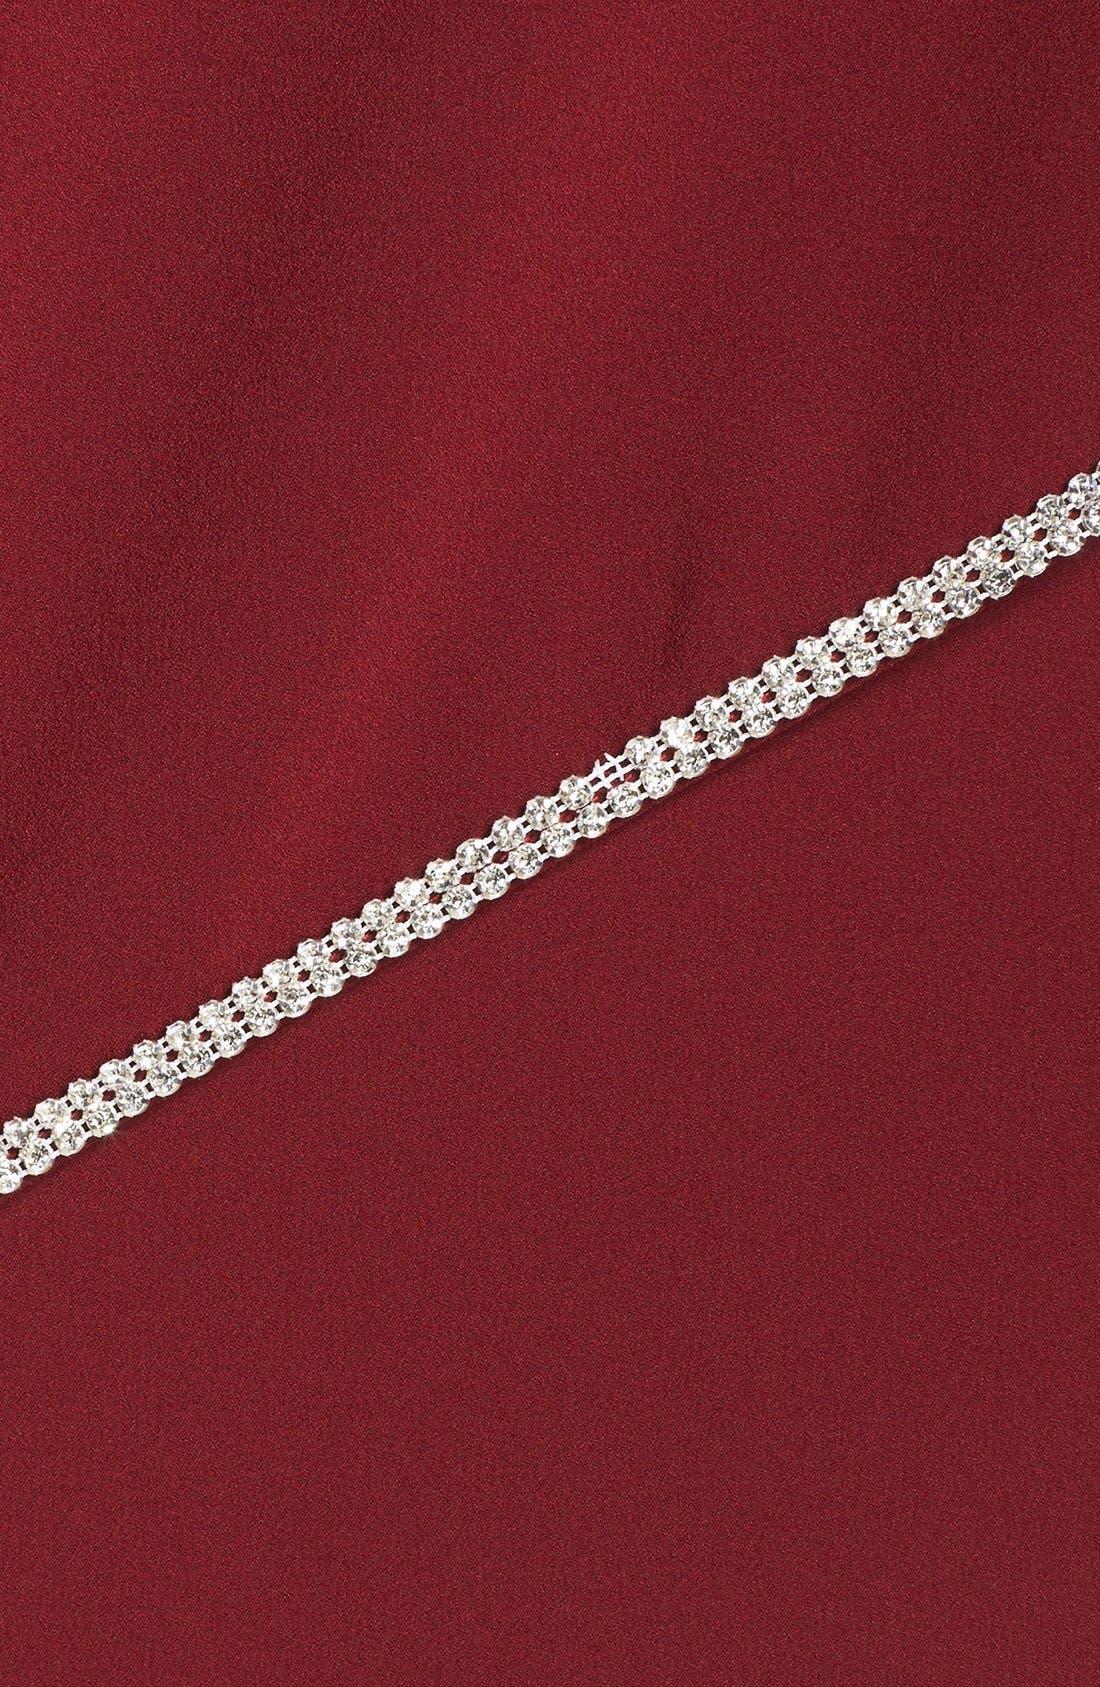 Embellished Overlay Sleeveless Crepe Column Gown,                             Alternate thumbnail 12, color,